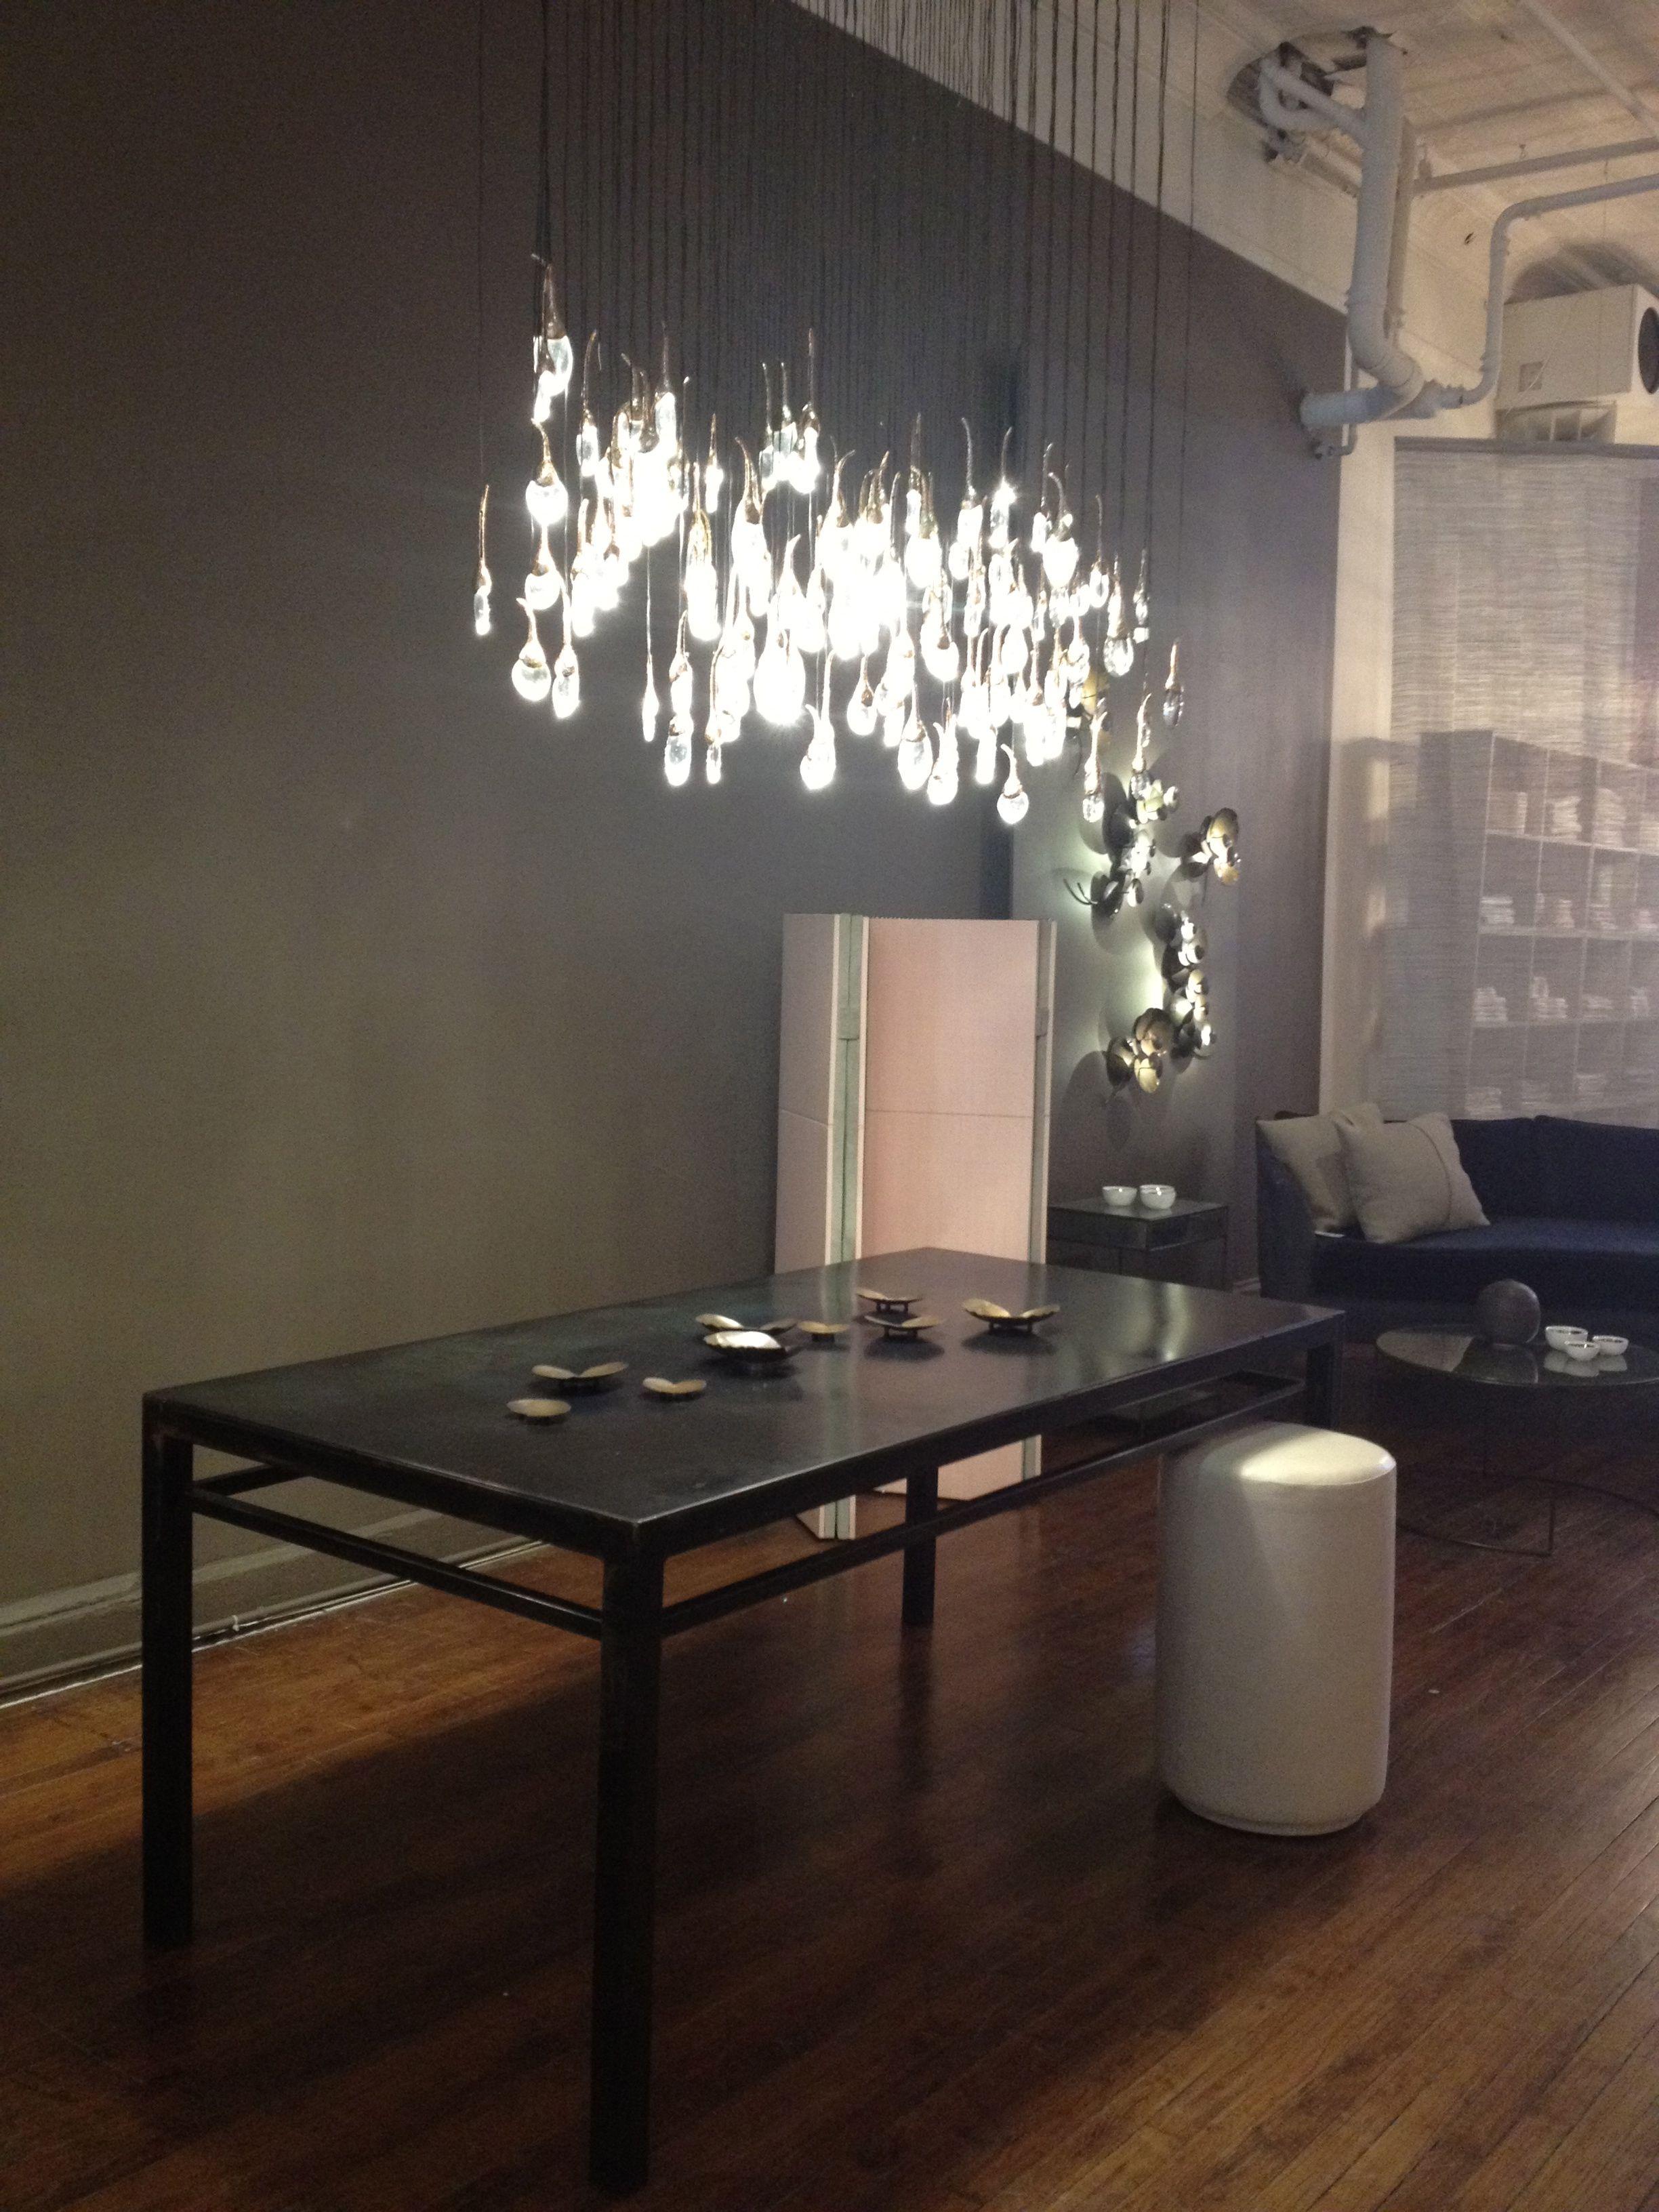 Led lighting desks chandeliers and lights room arubaitofo Images